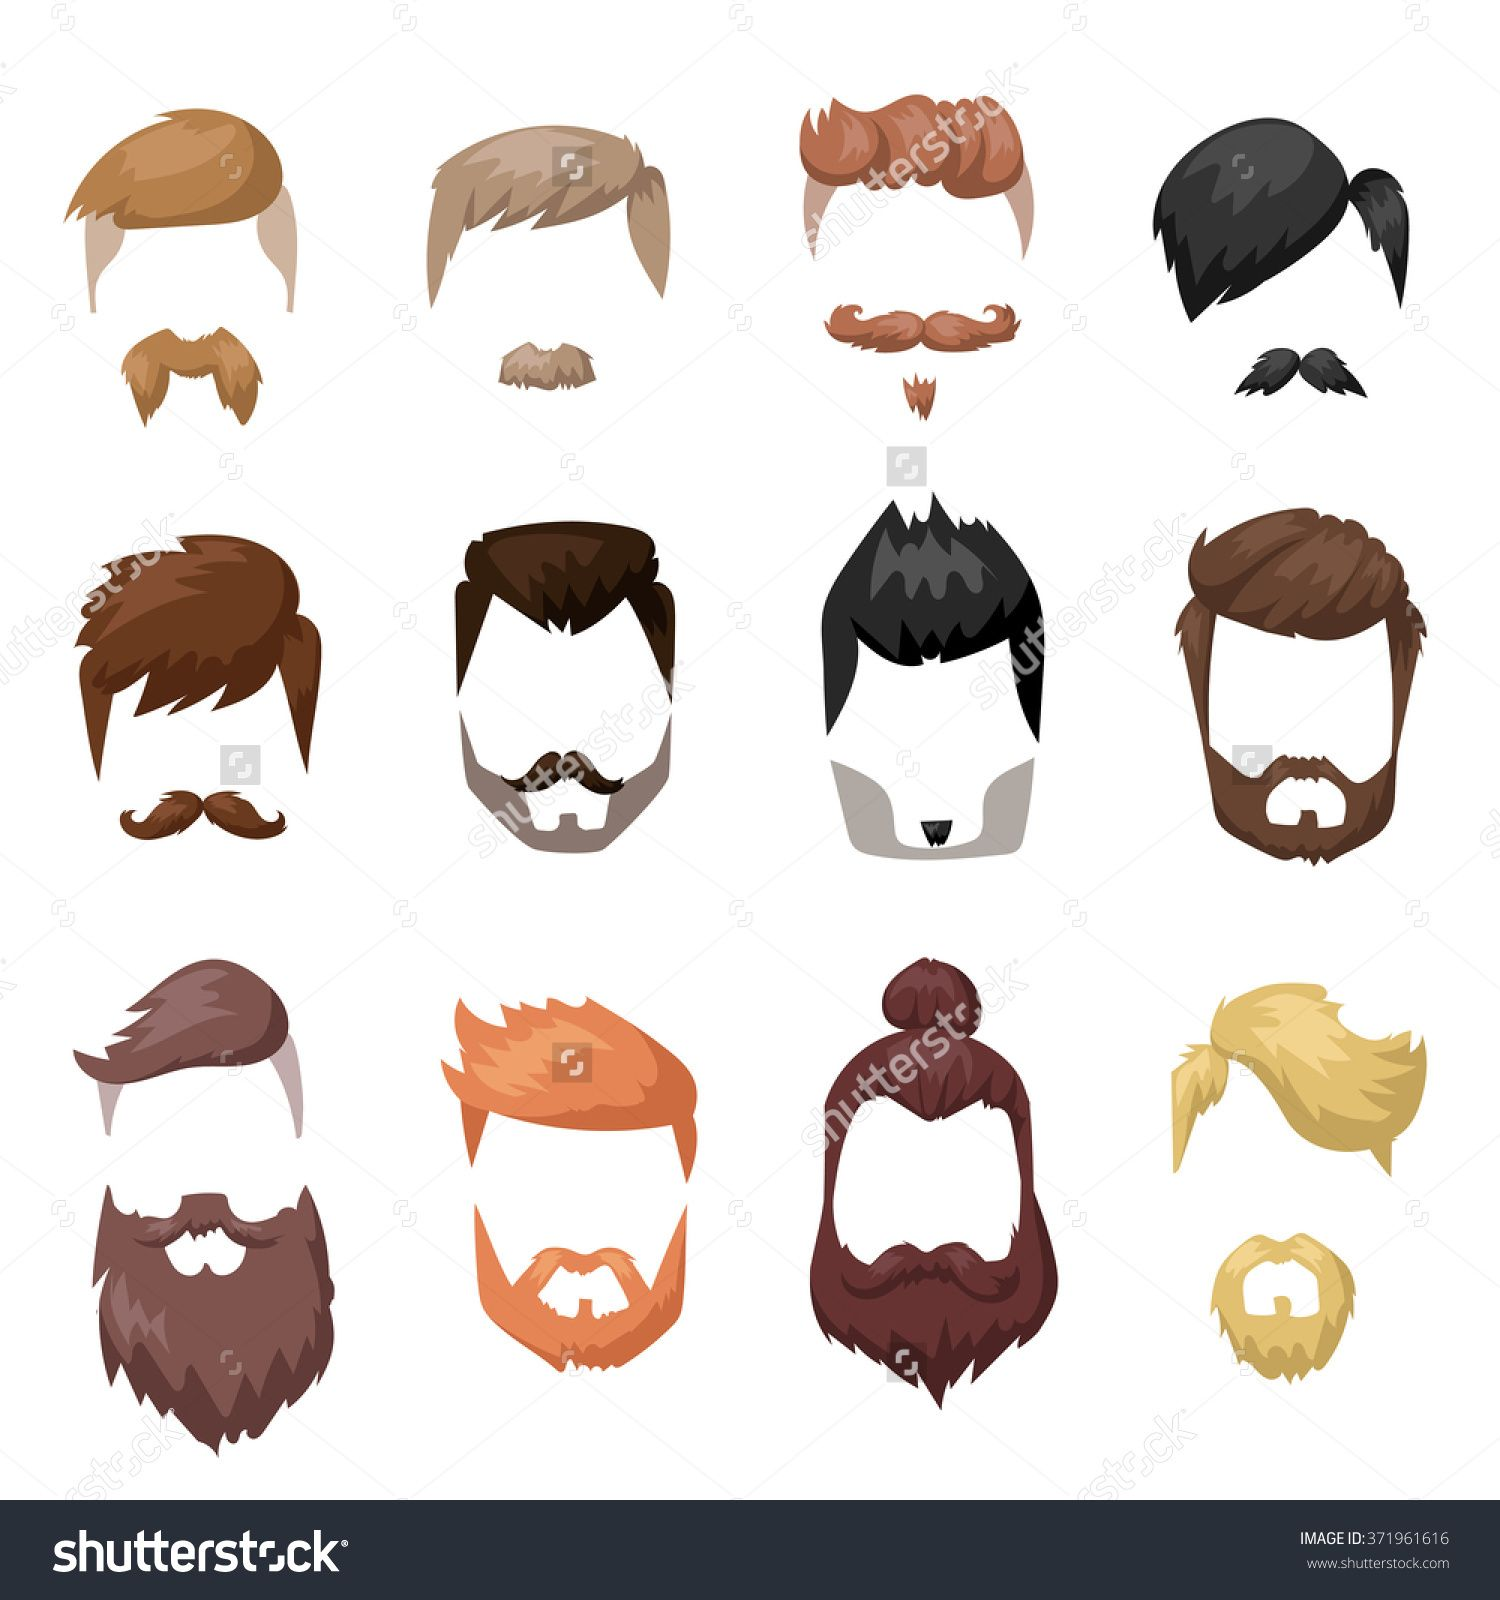 Hairstyles and face cut. Beard clipart facial hair